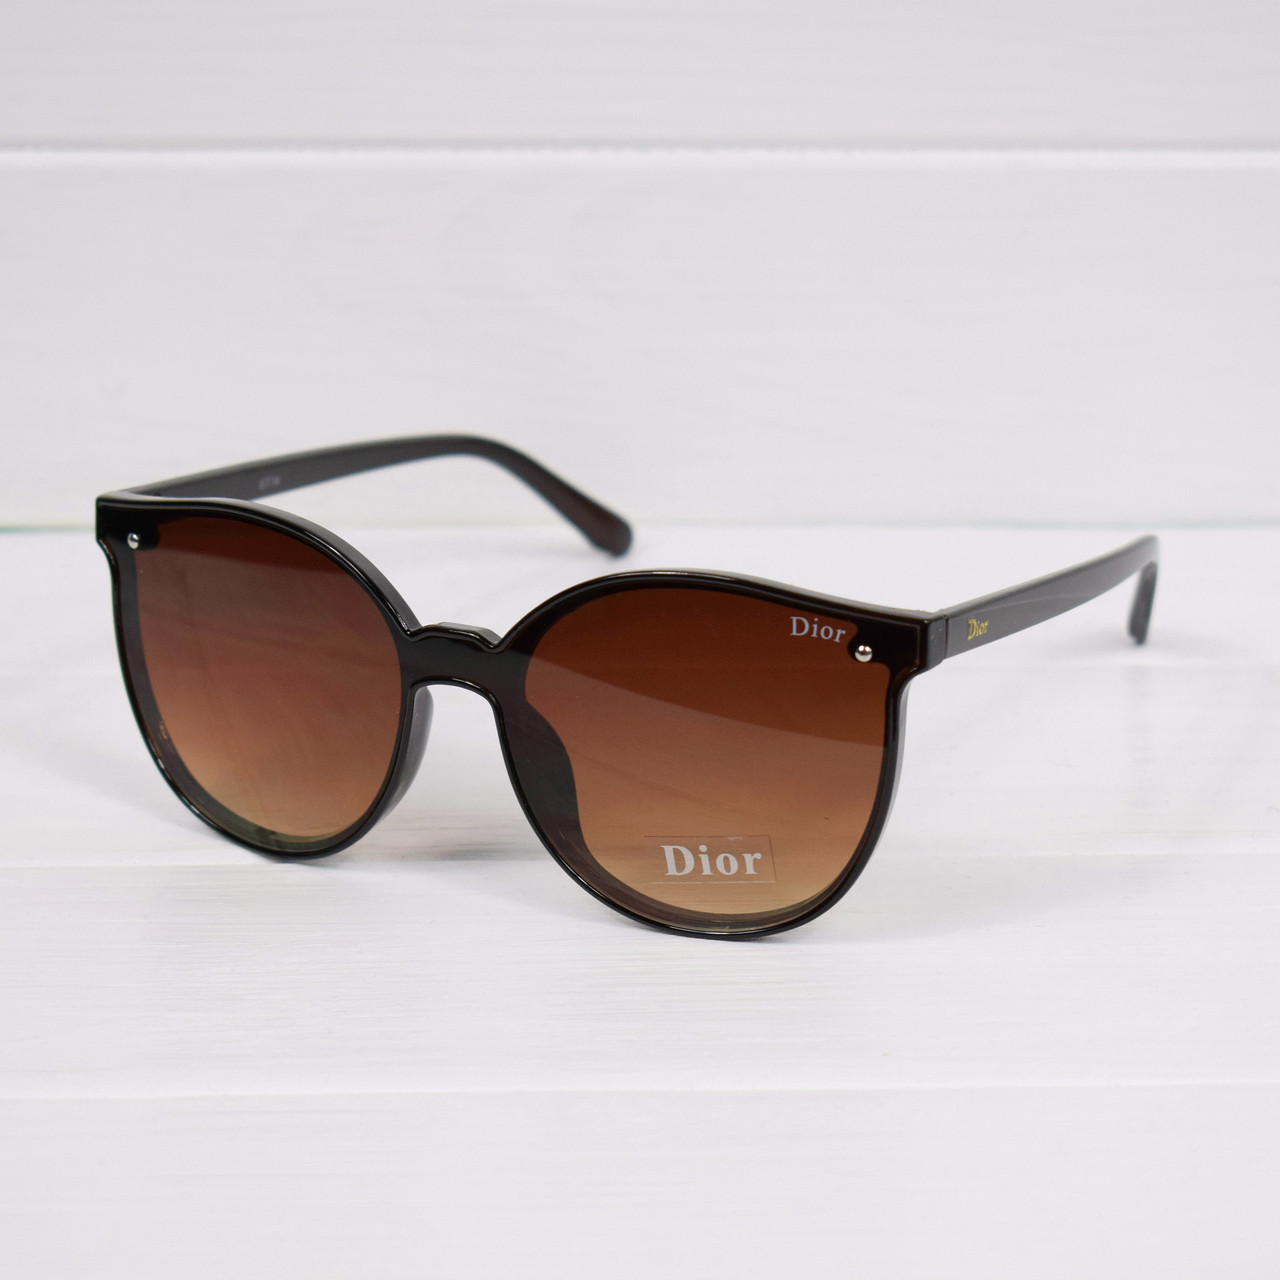 2e8676b92707 Очки женские от солнца в стиле Dior Fire коричневые, магазин очков ...